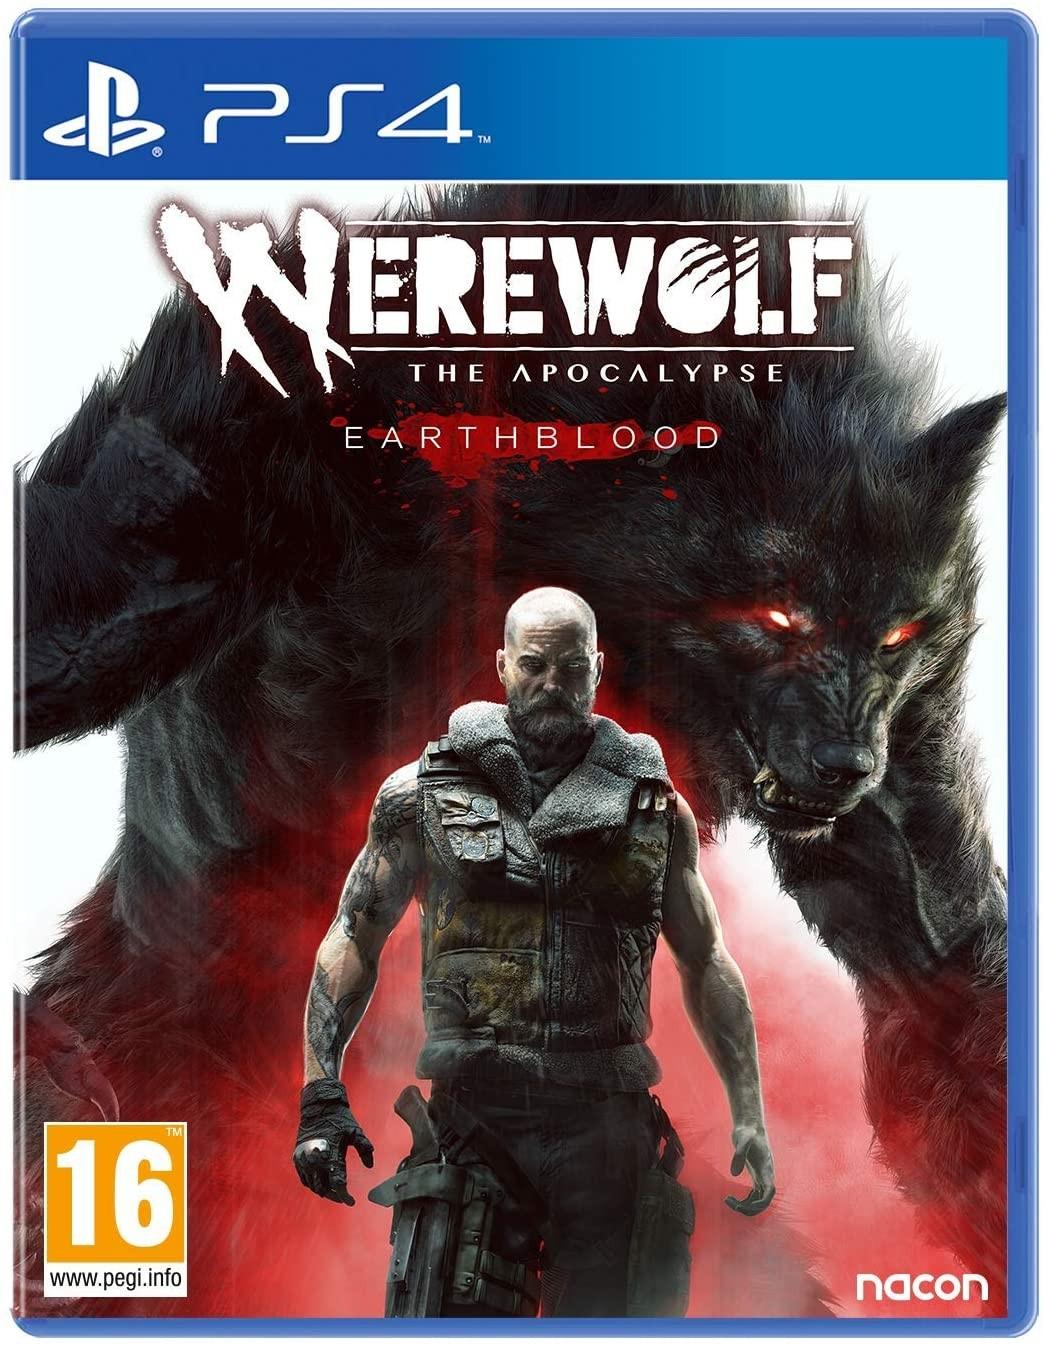 Werewolf The Apocalypse Earthblood PS4